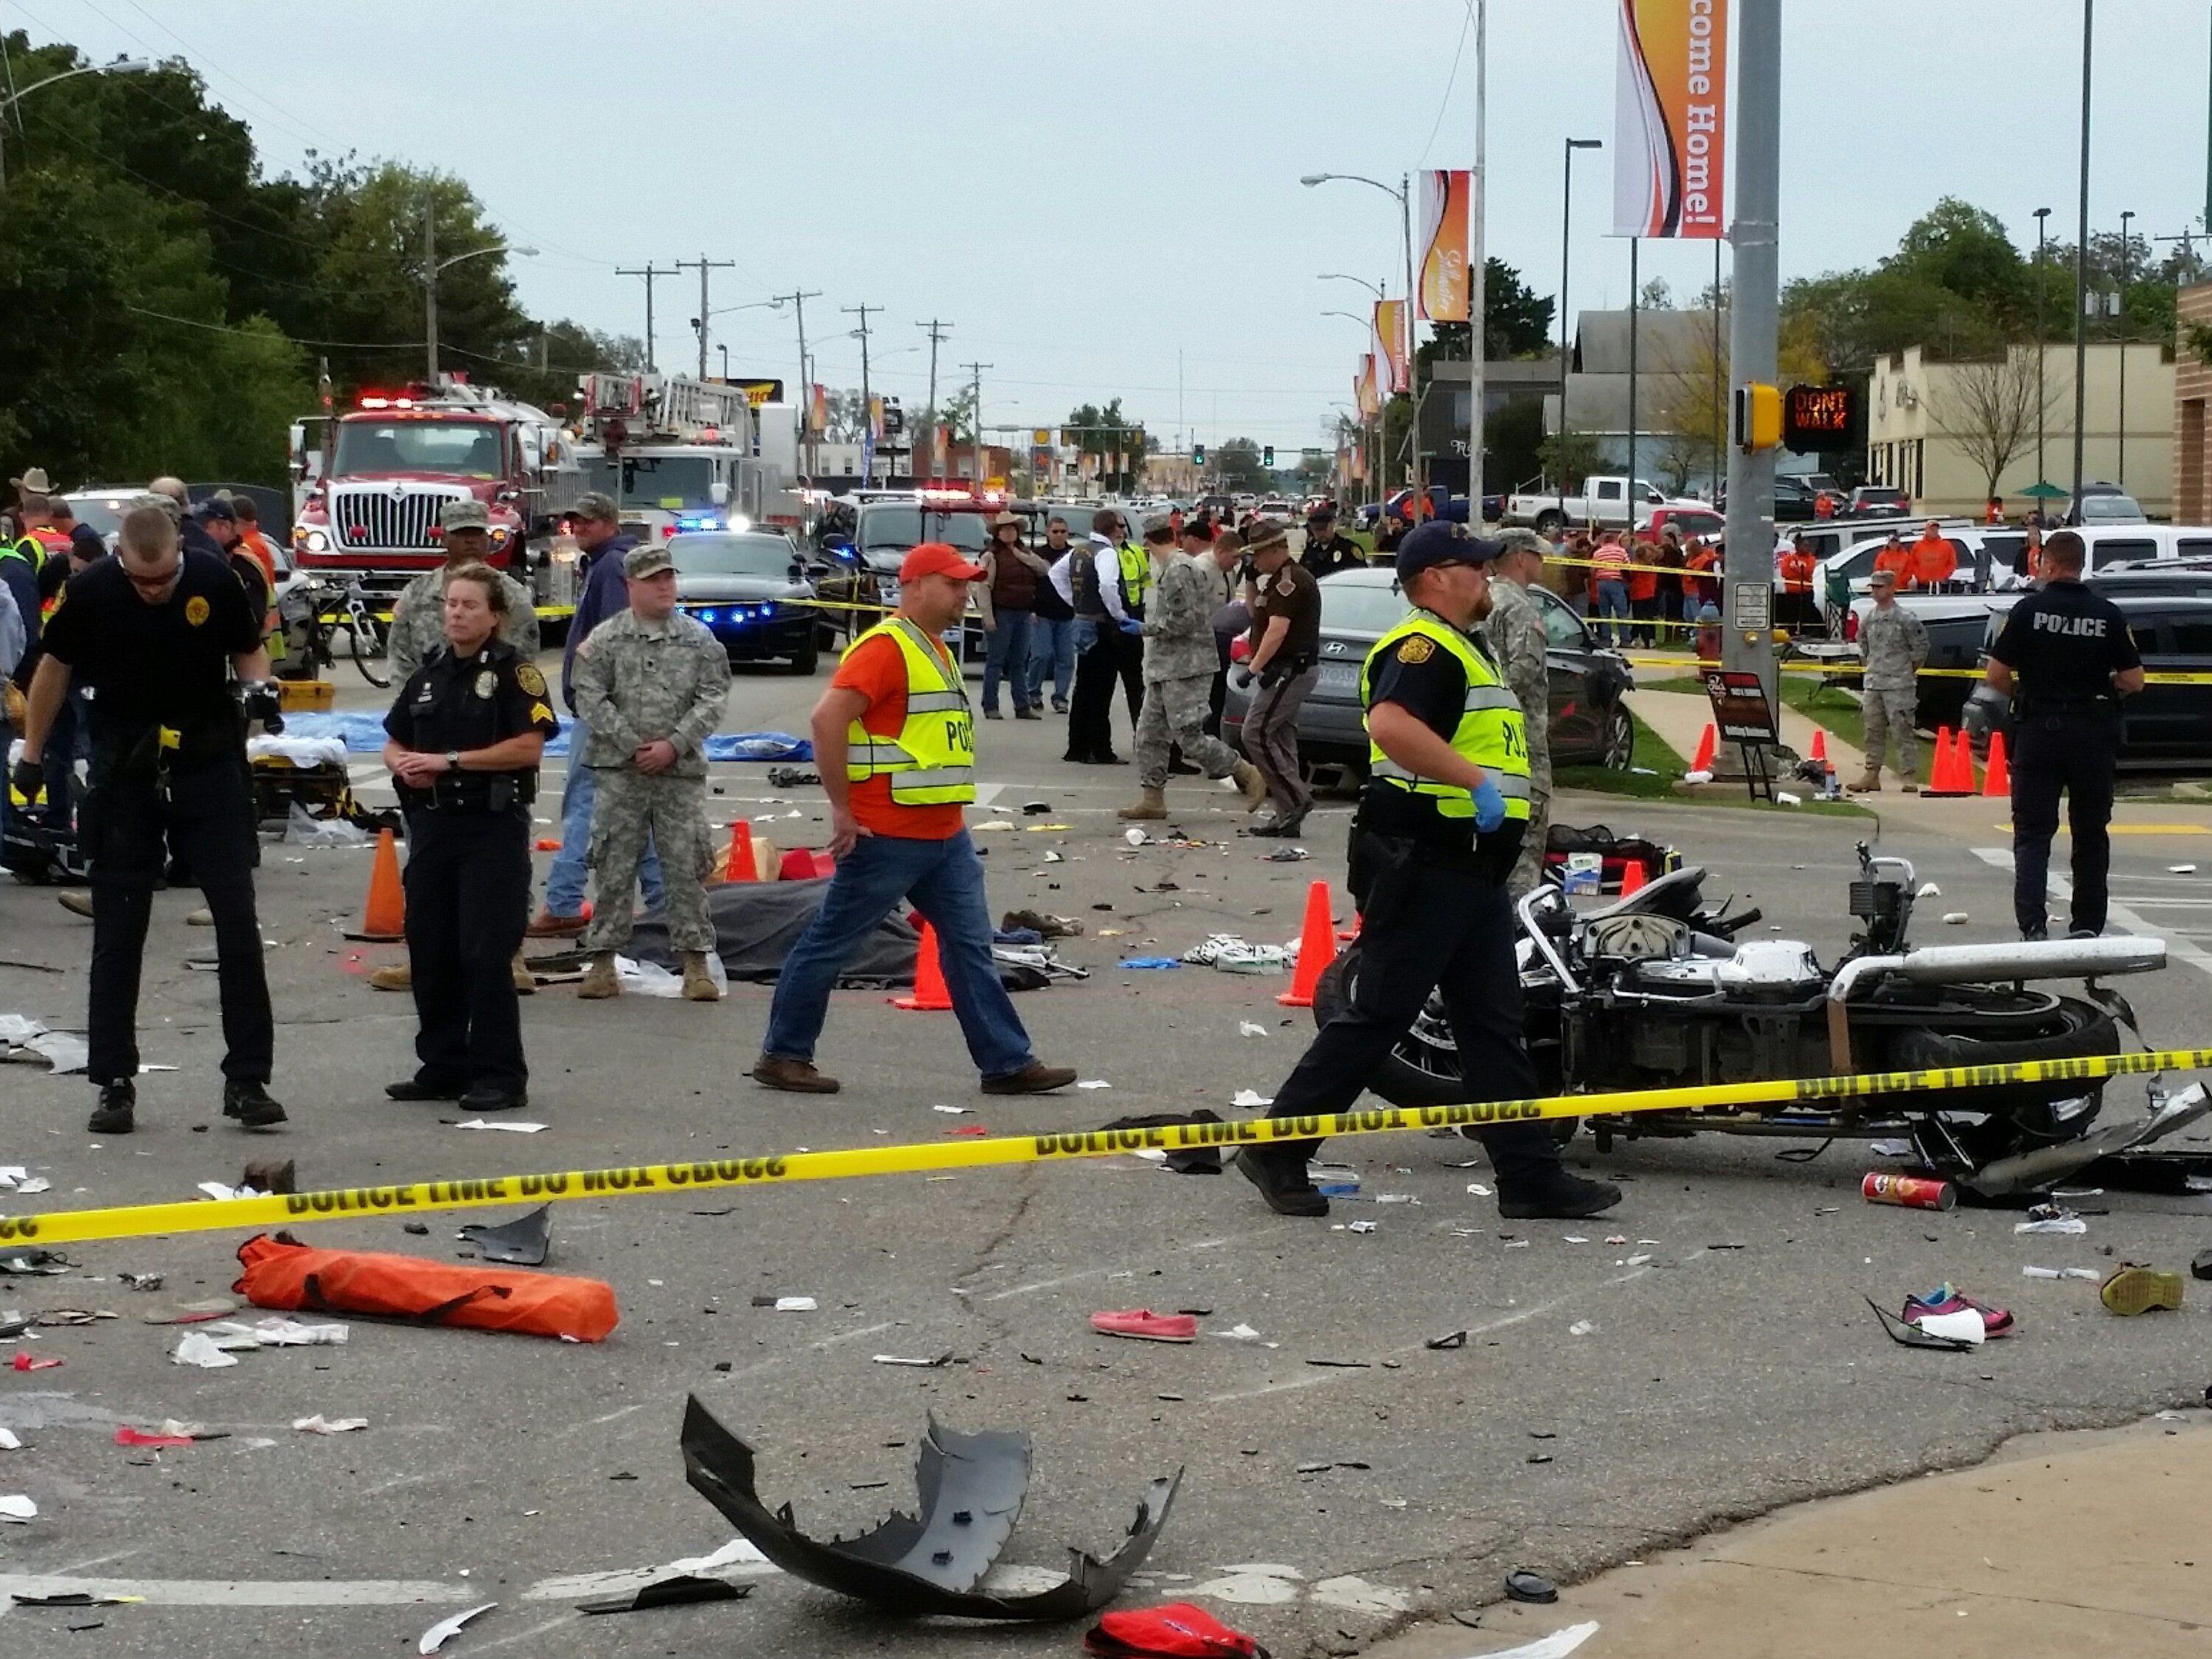 Auto rast in Zuschauermenge: Tote bei Parade in Oklahoma